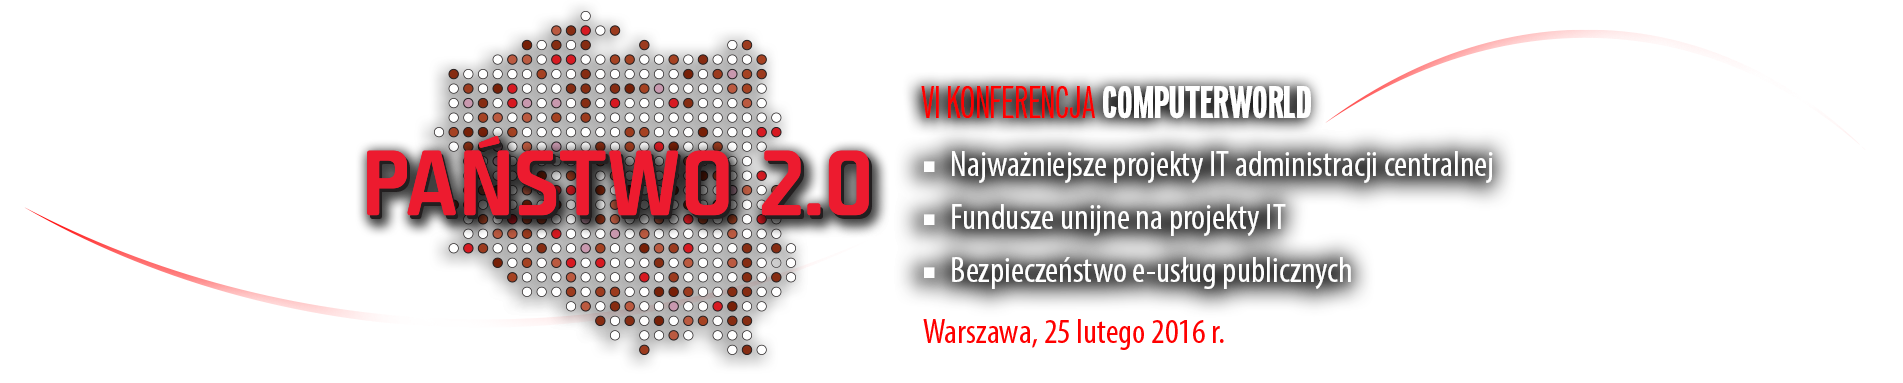 VI Konferencja Computerworld Państwo 2.0